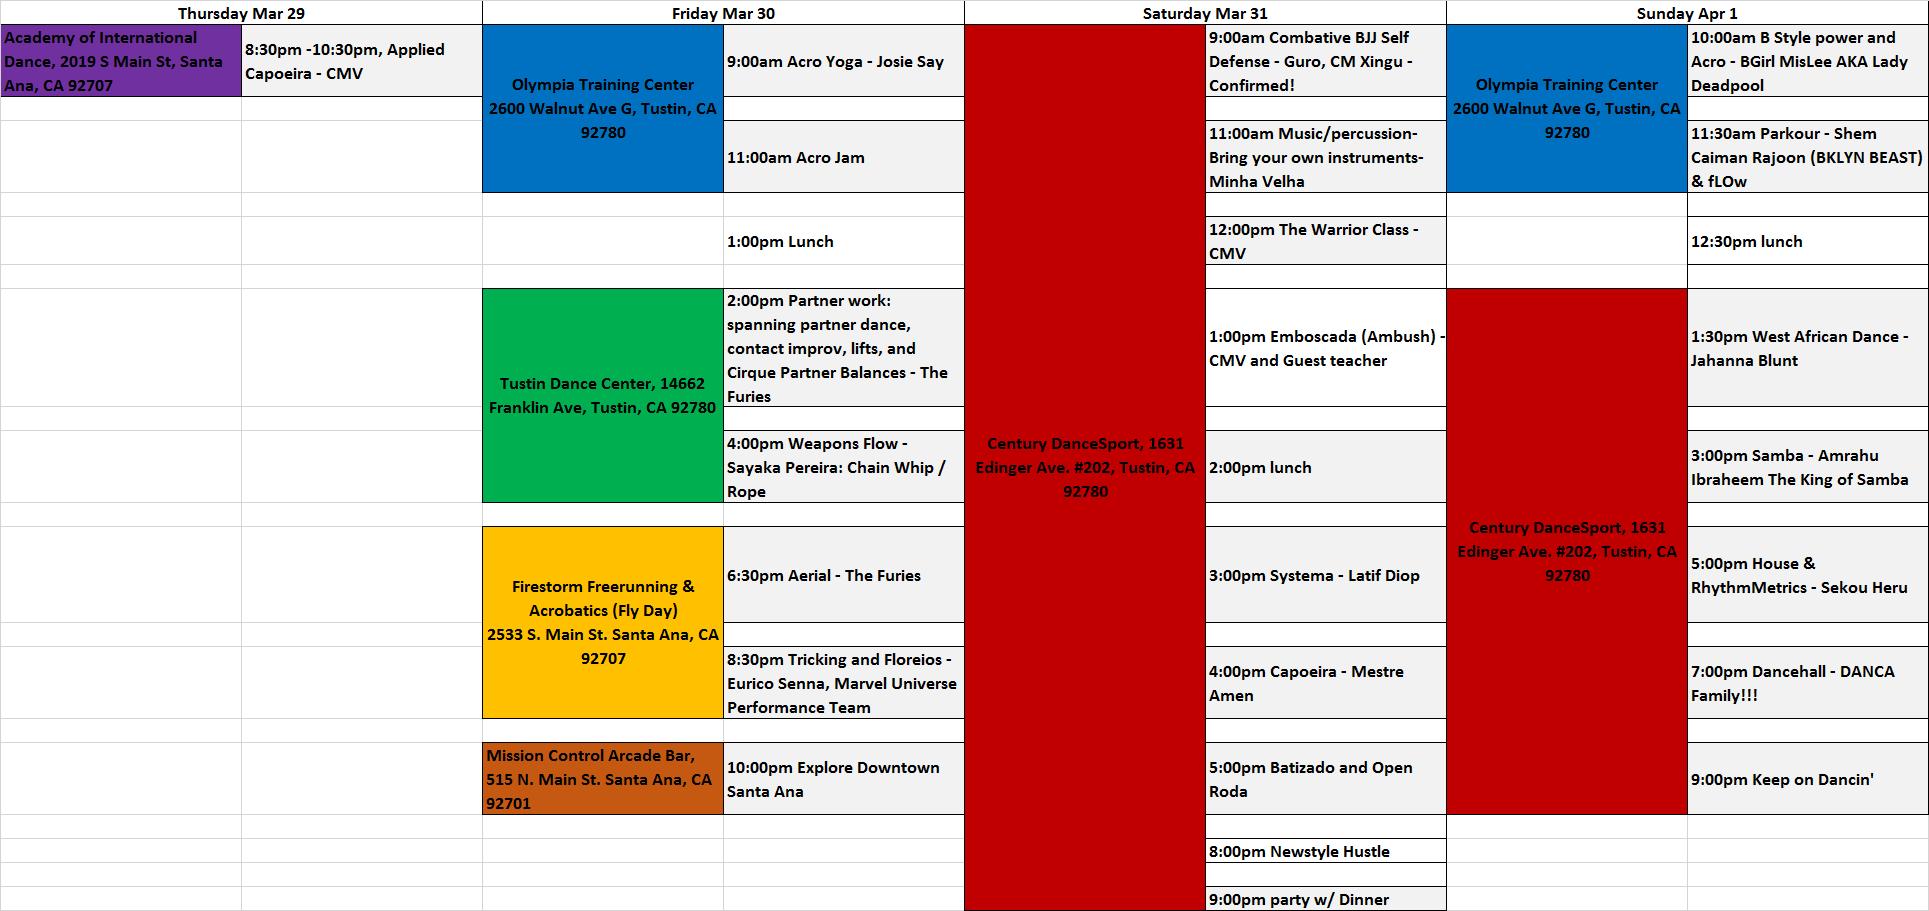 FMFSchedule2018.png